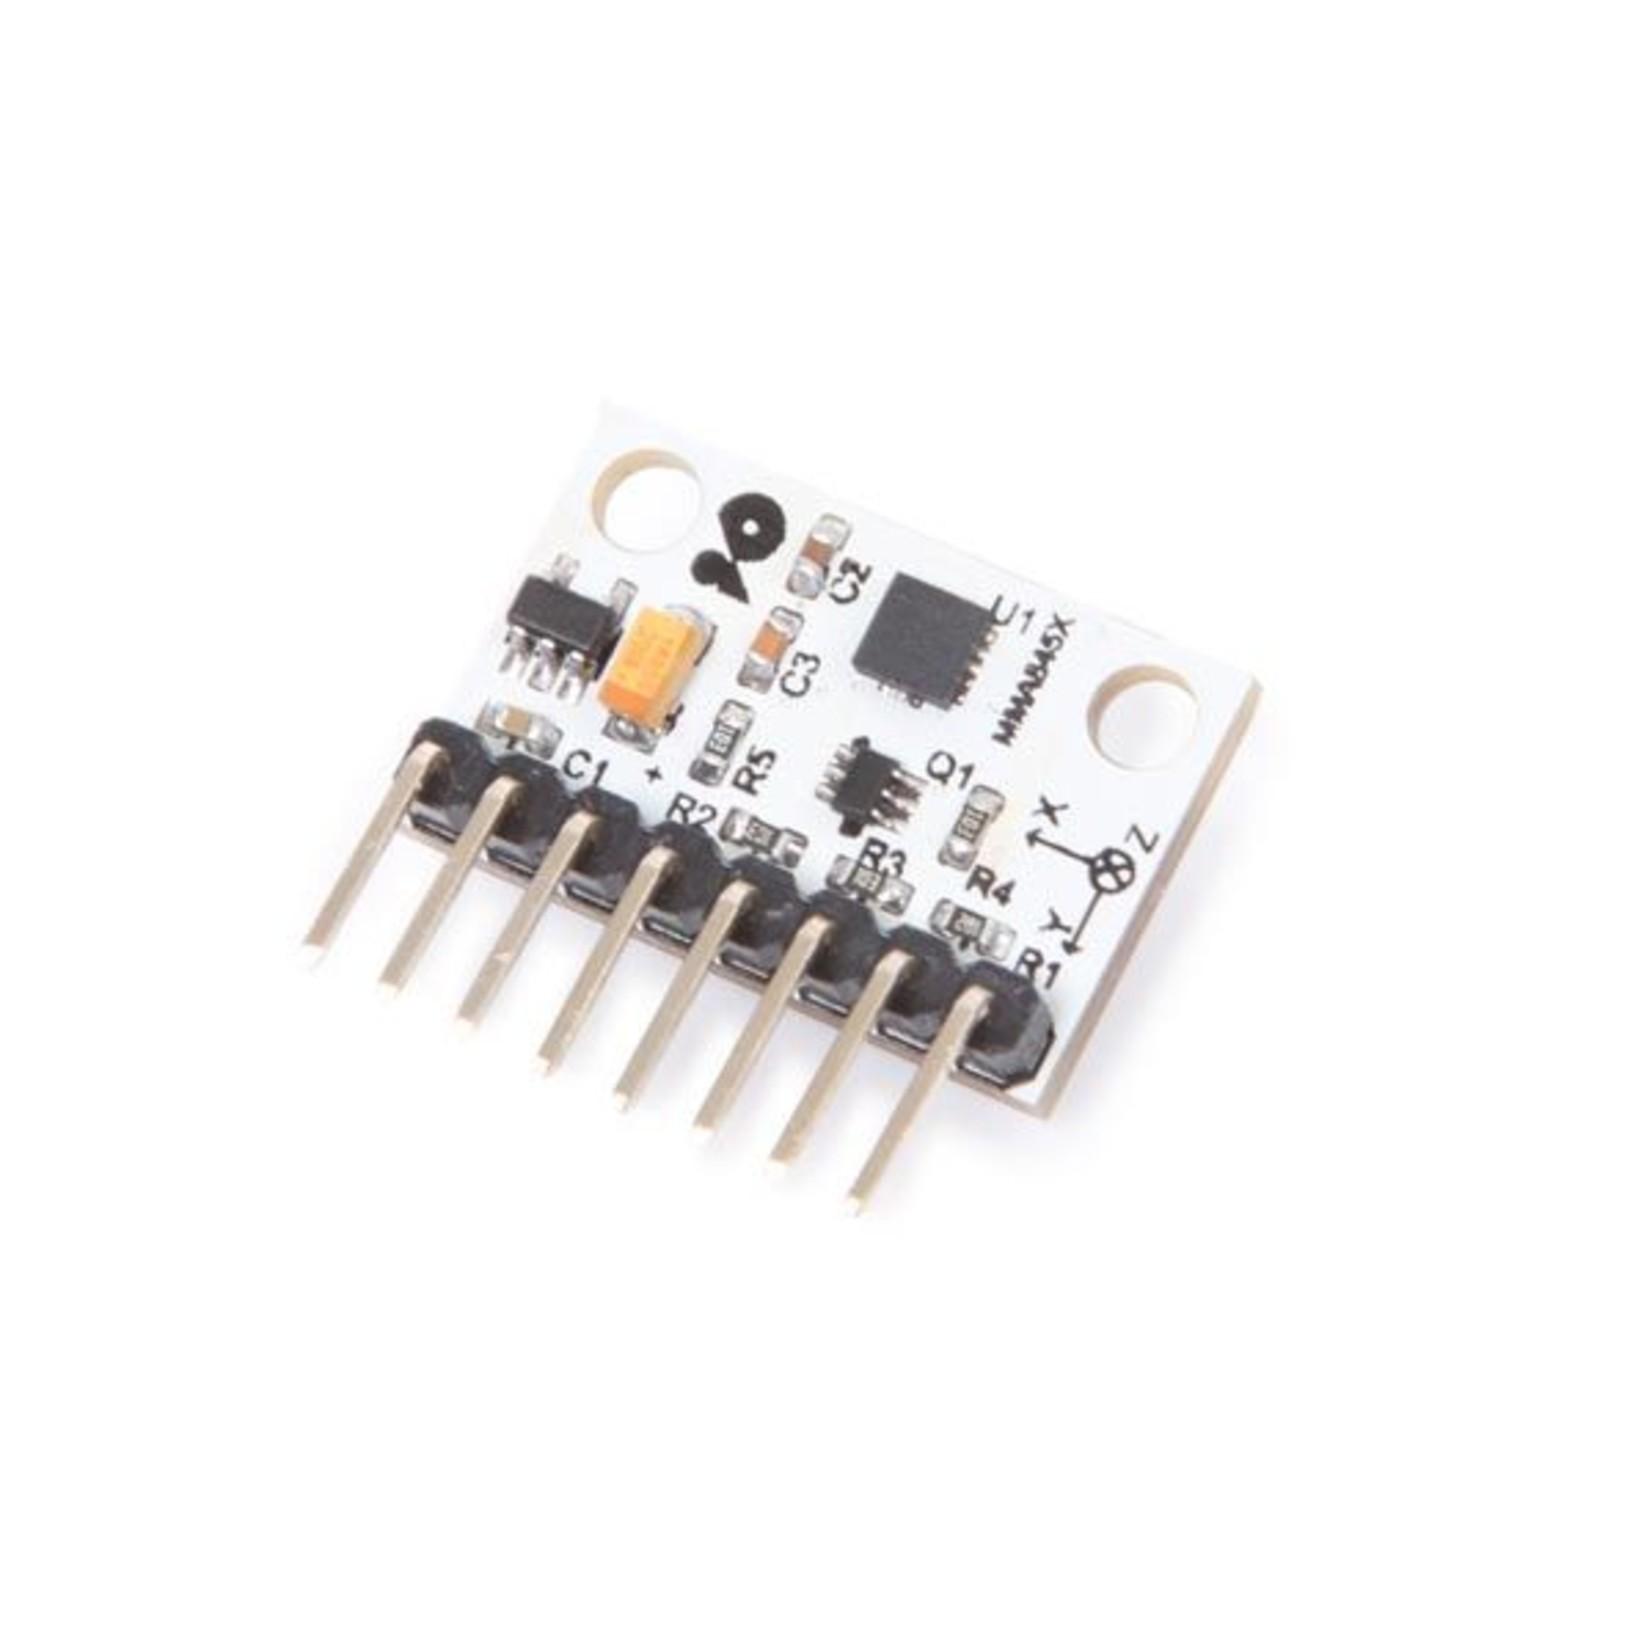 Velleman 3-assige digitale accelerometer - MMA8452